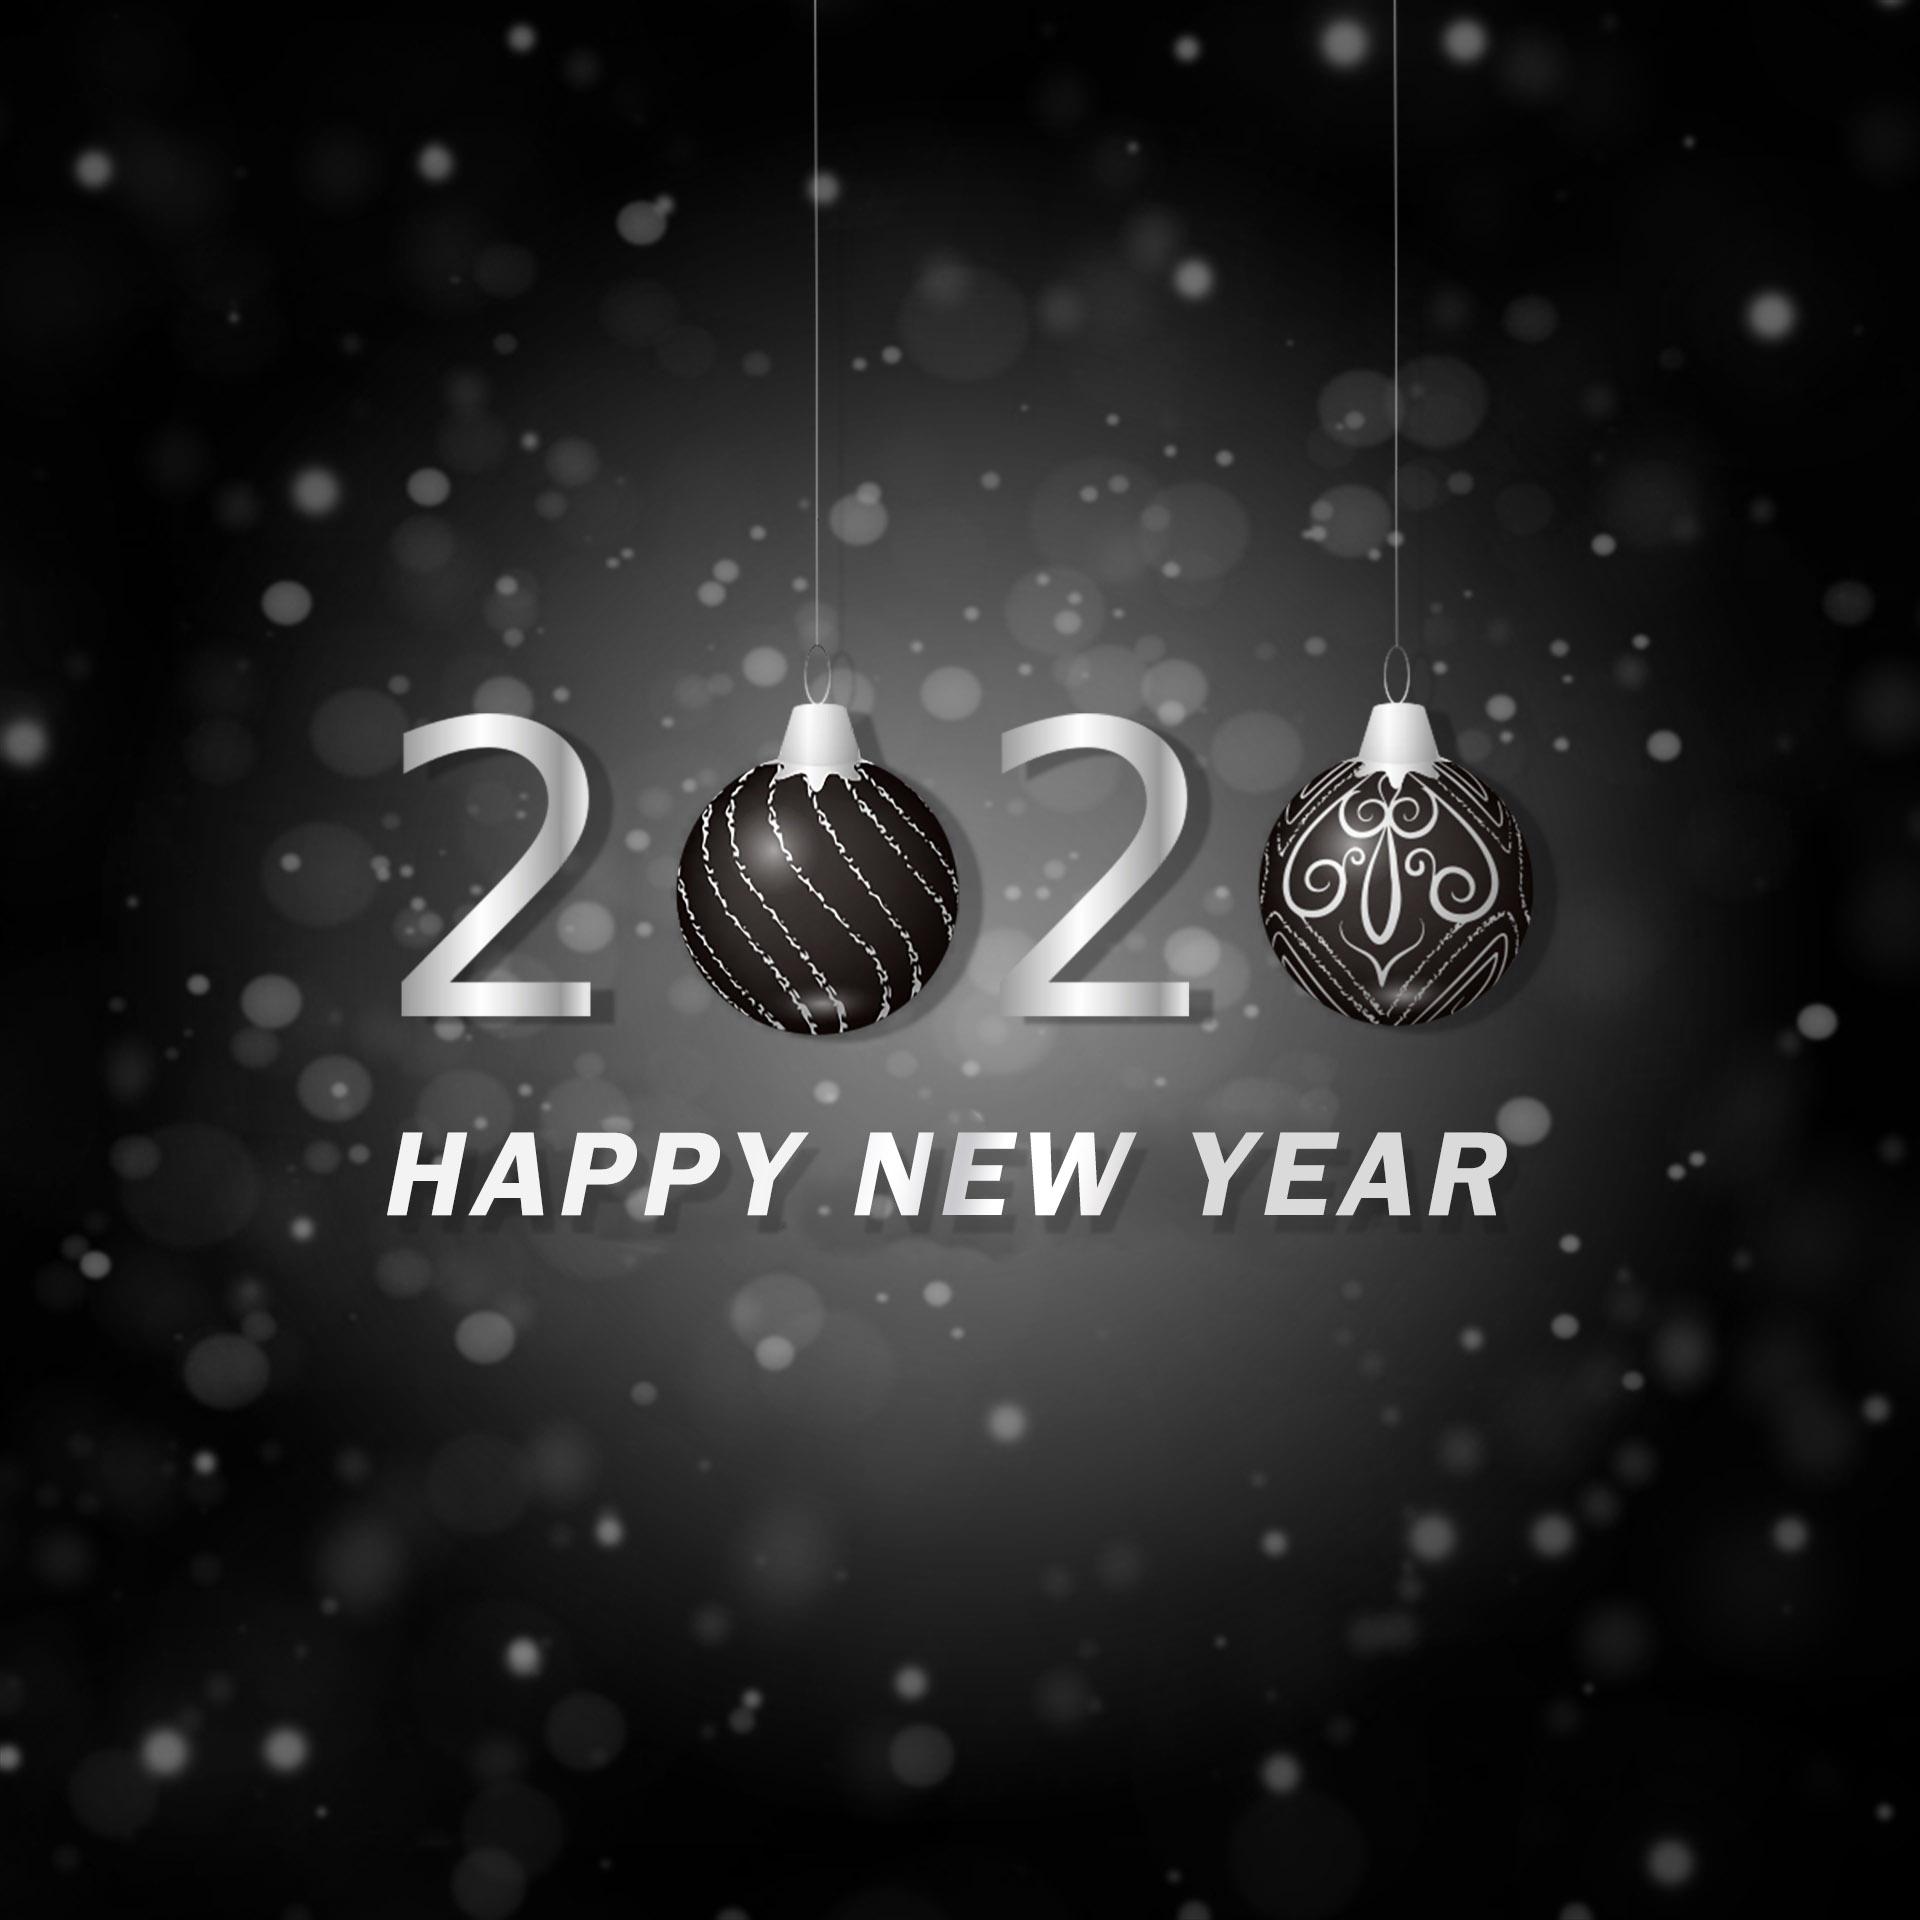 Happy New Year Black 2020 Digital Signage Content